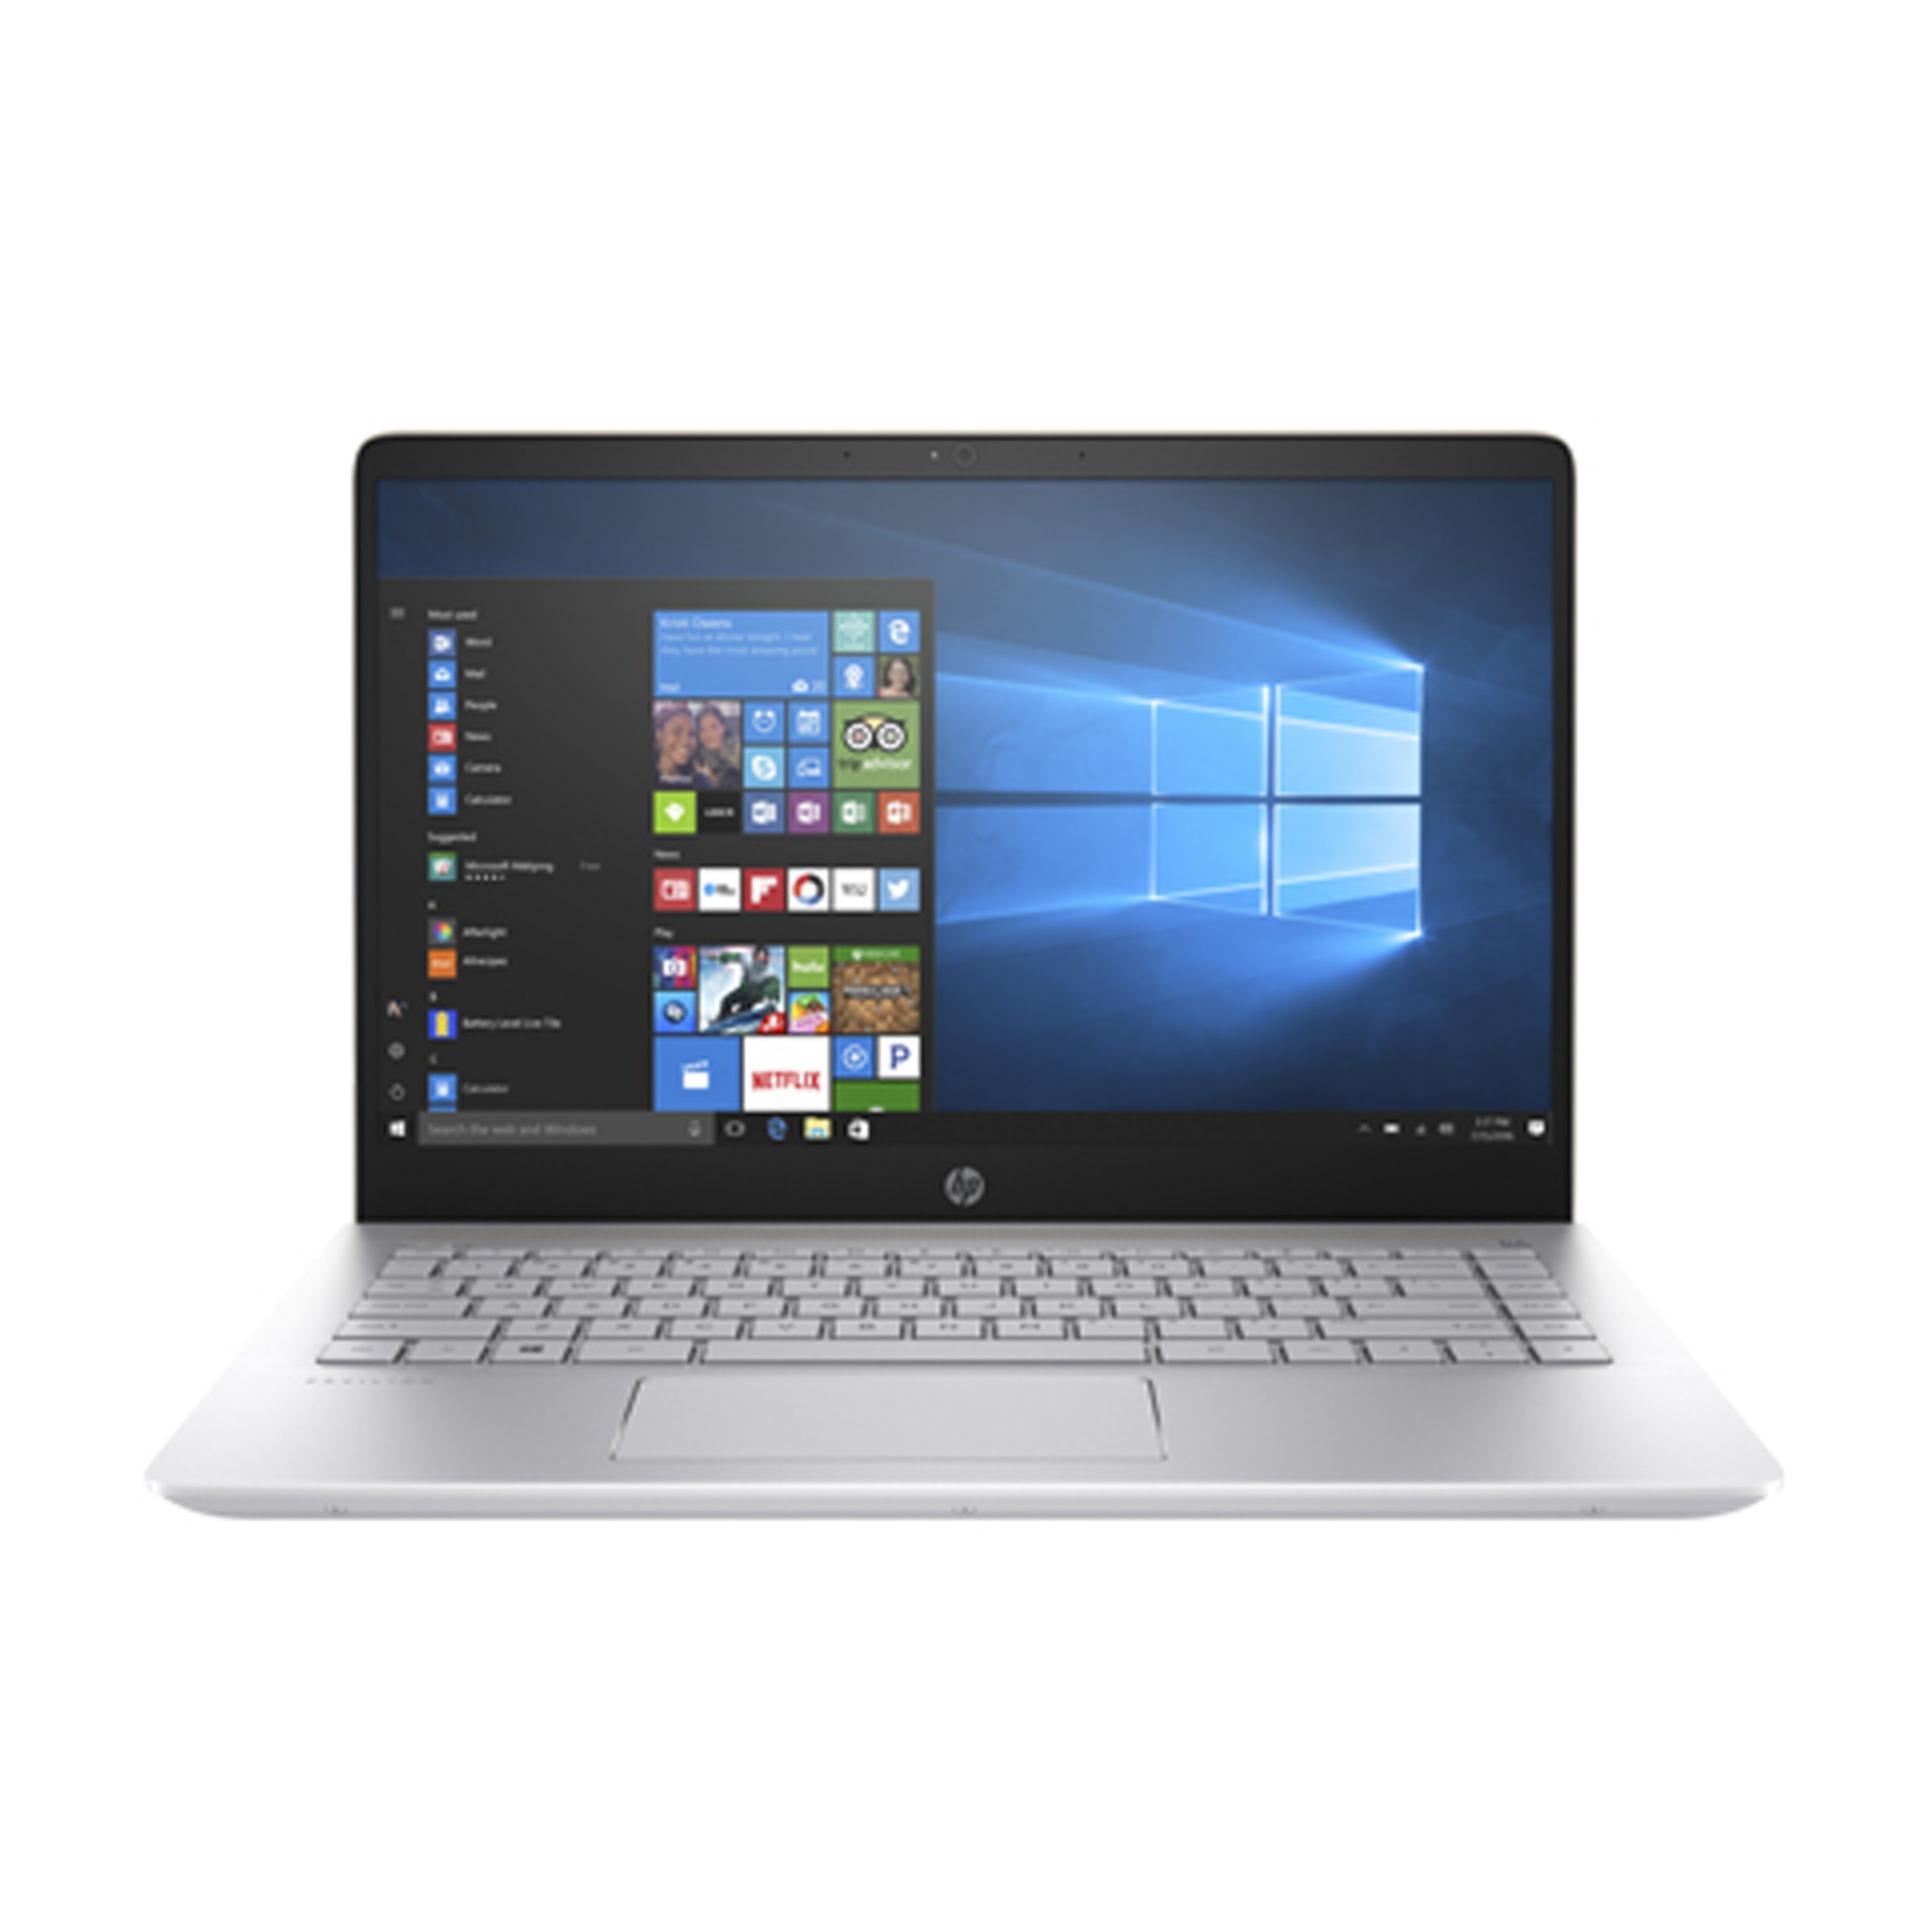 HP Pavilion 14-bf005TX GOLD Ci5-7200U - 8GB - 1TB+128GbSSD - GeForce 940MX 2GB - Win 10H - 2YR